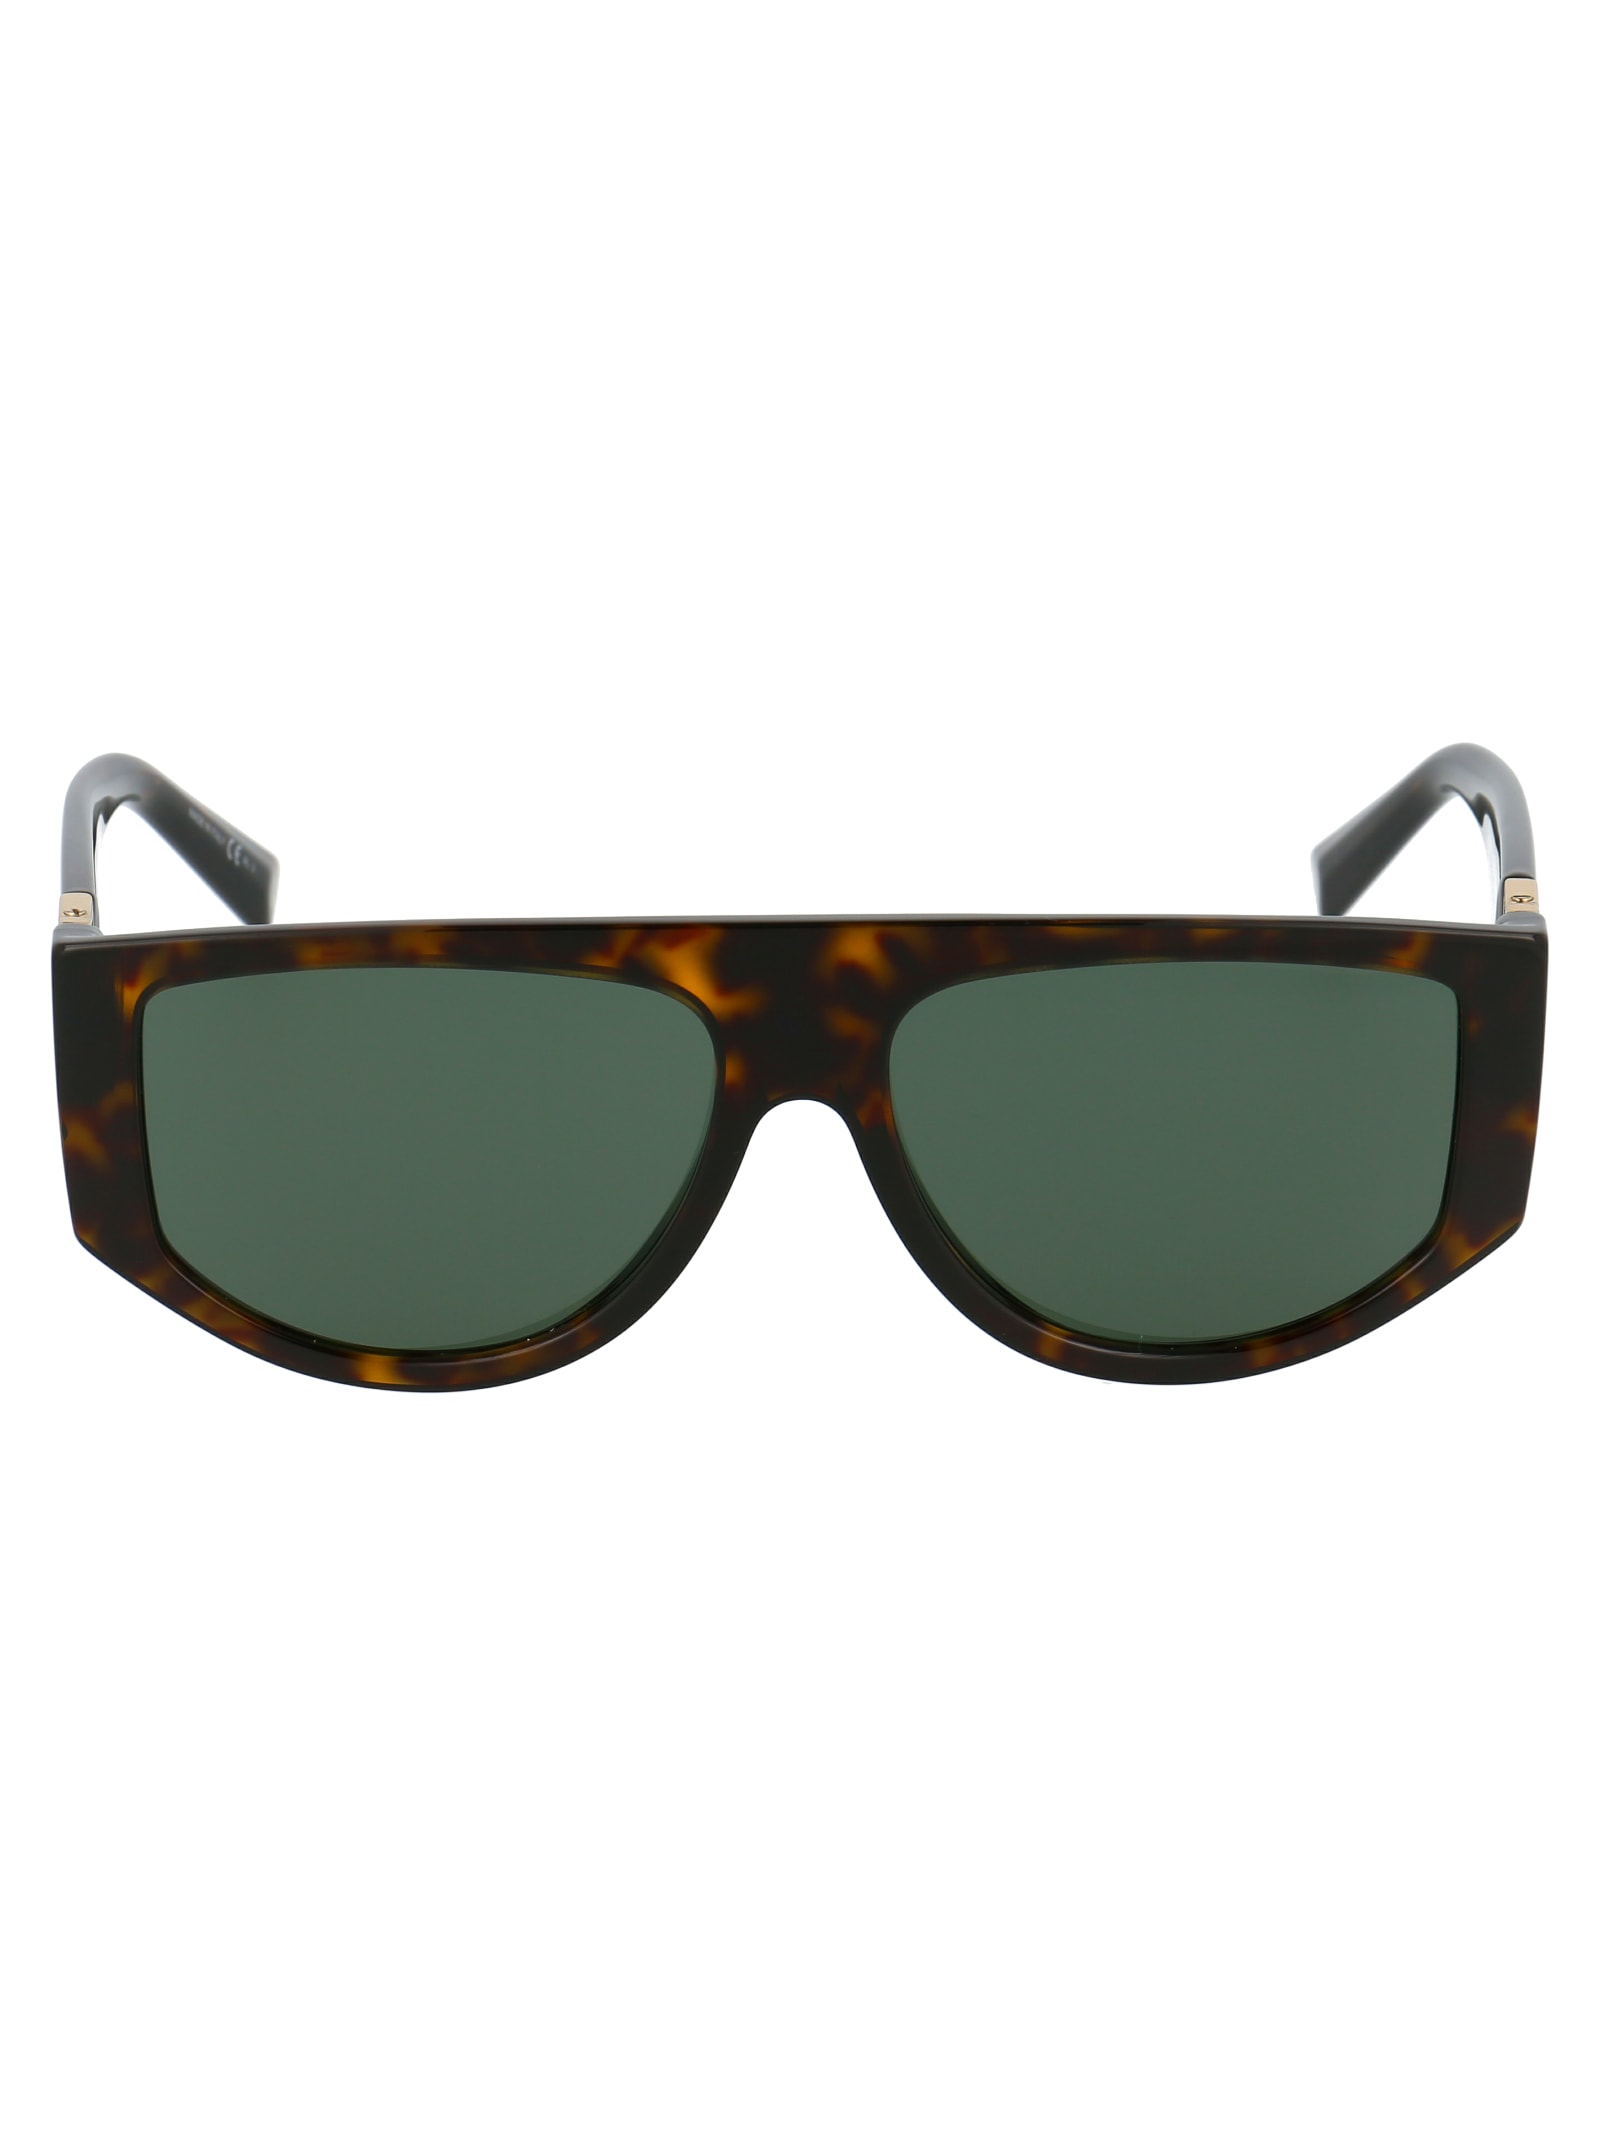 Gv 7156/s Sunglasses